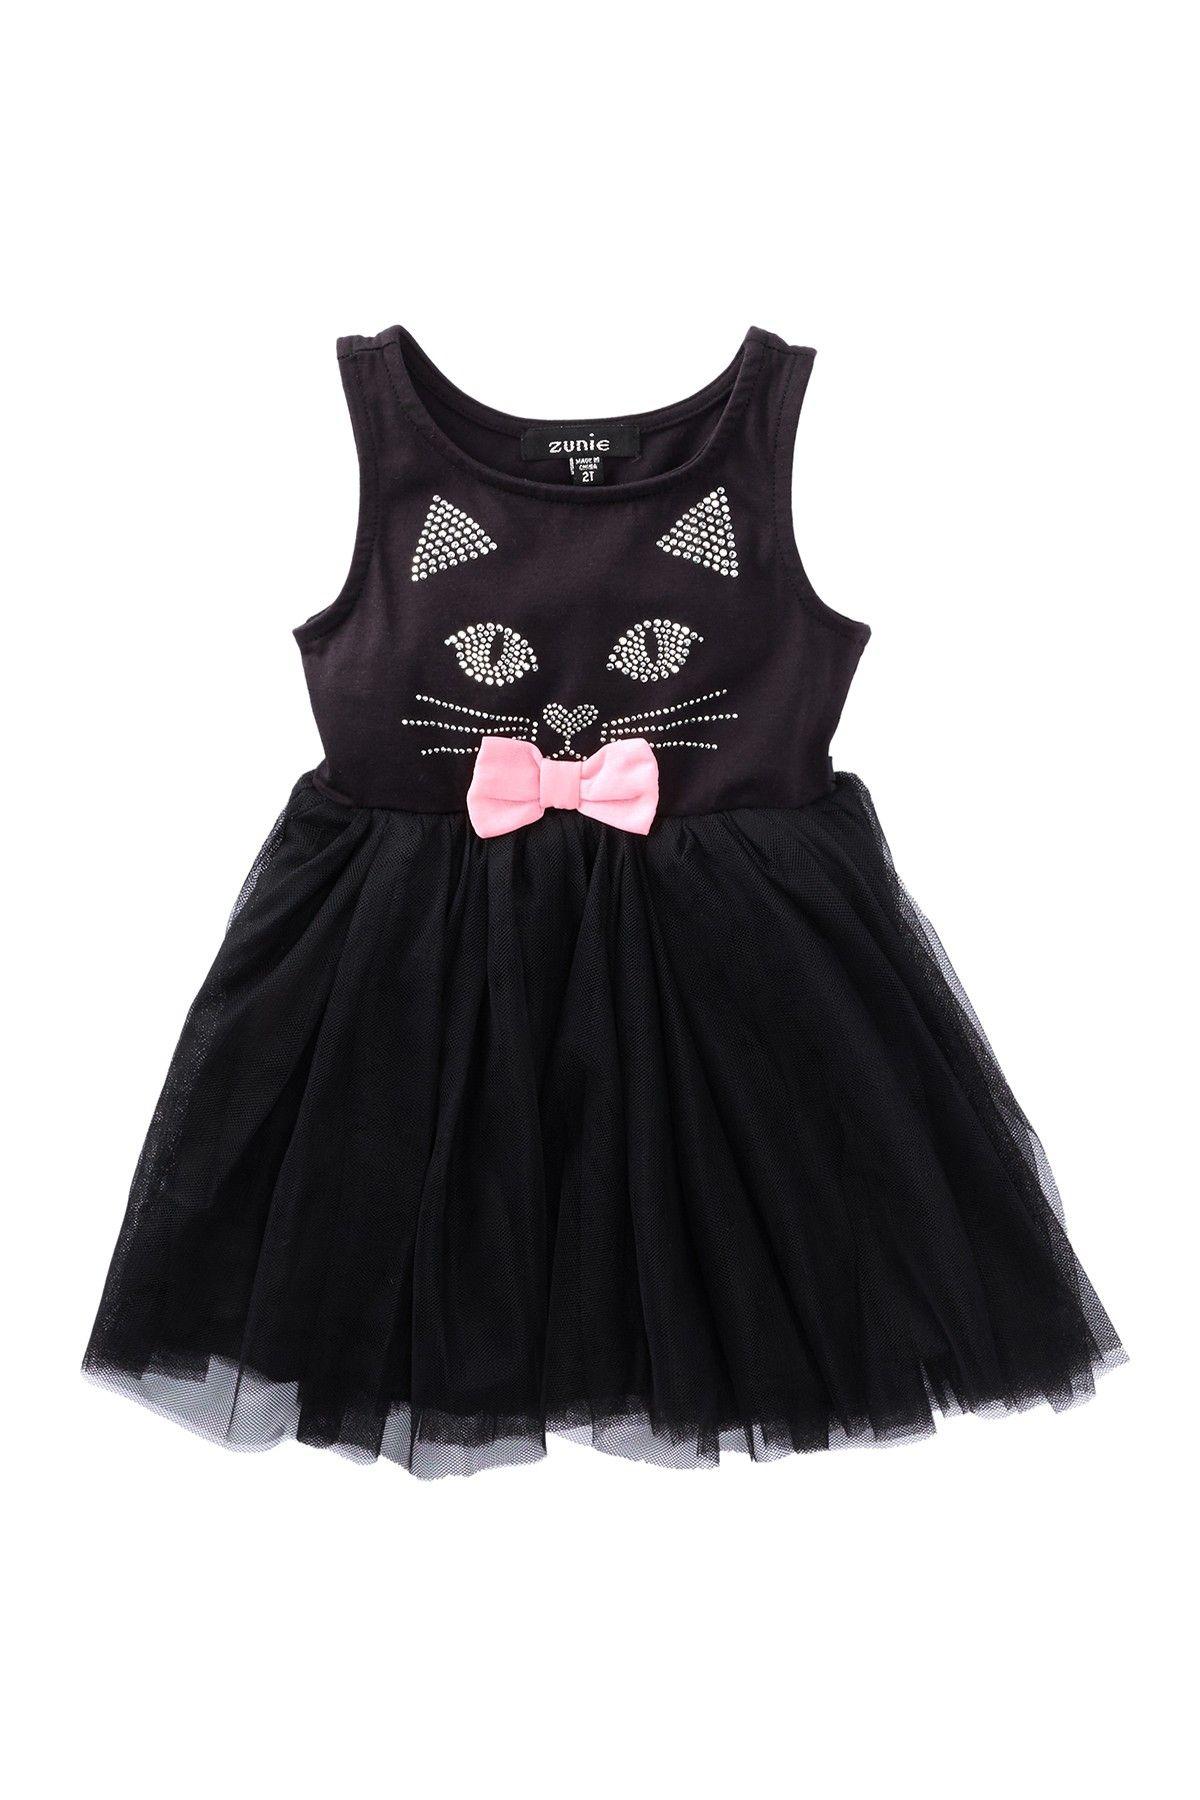 Zunie kitty face sleeveless dress toddler girls kitty face and